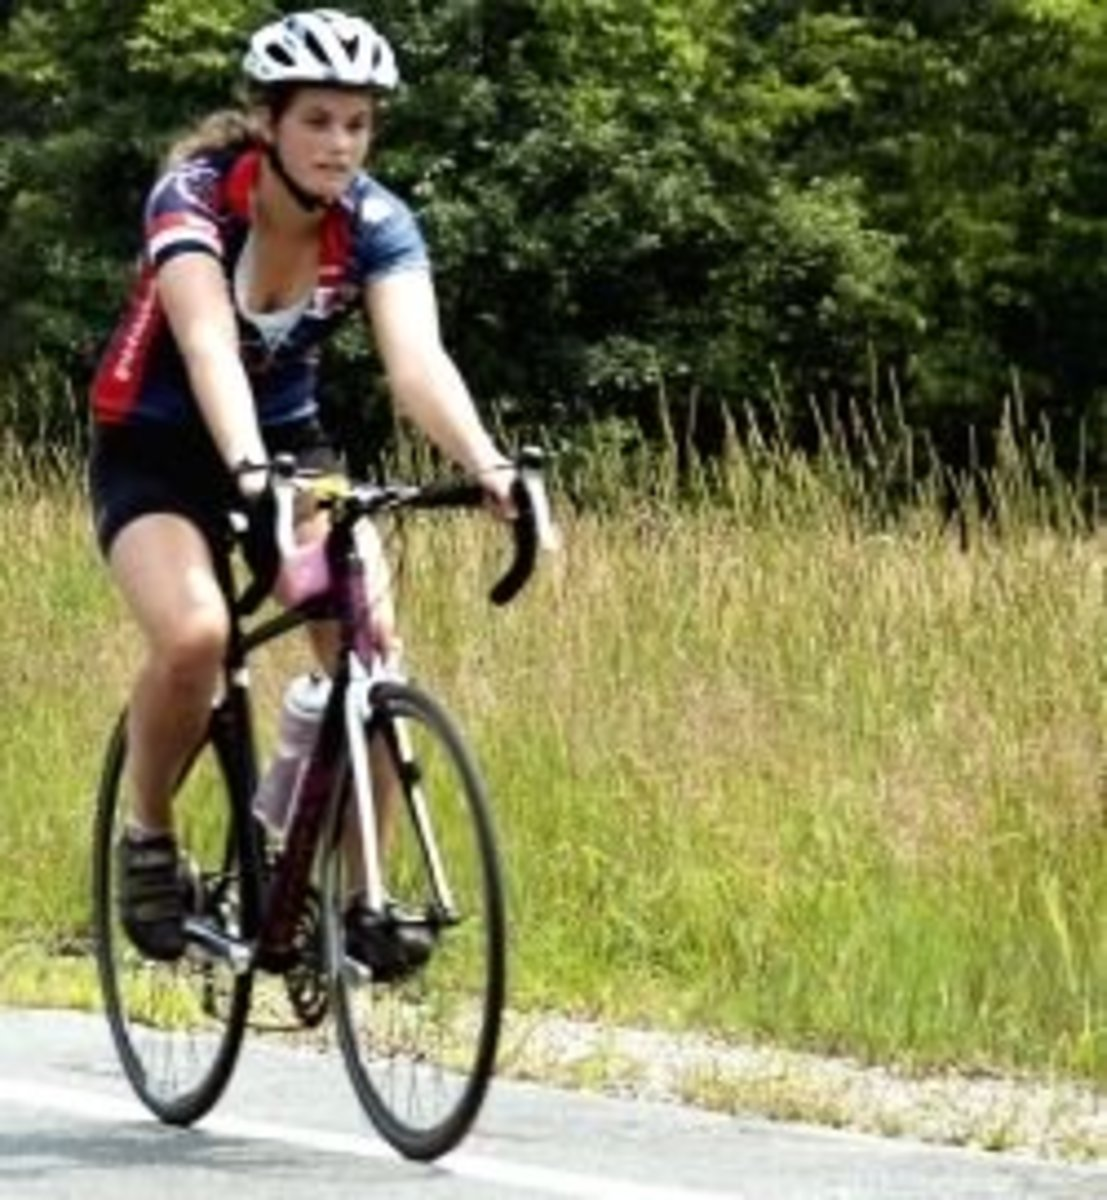 Top Five Best Cheap Road Bikes Online - Getting a Good Deal Online